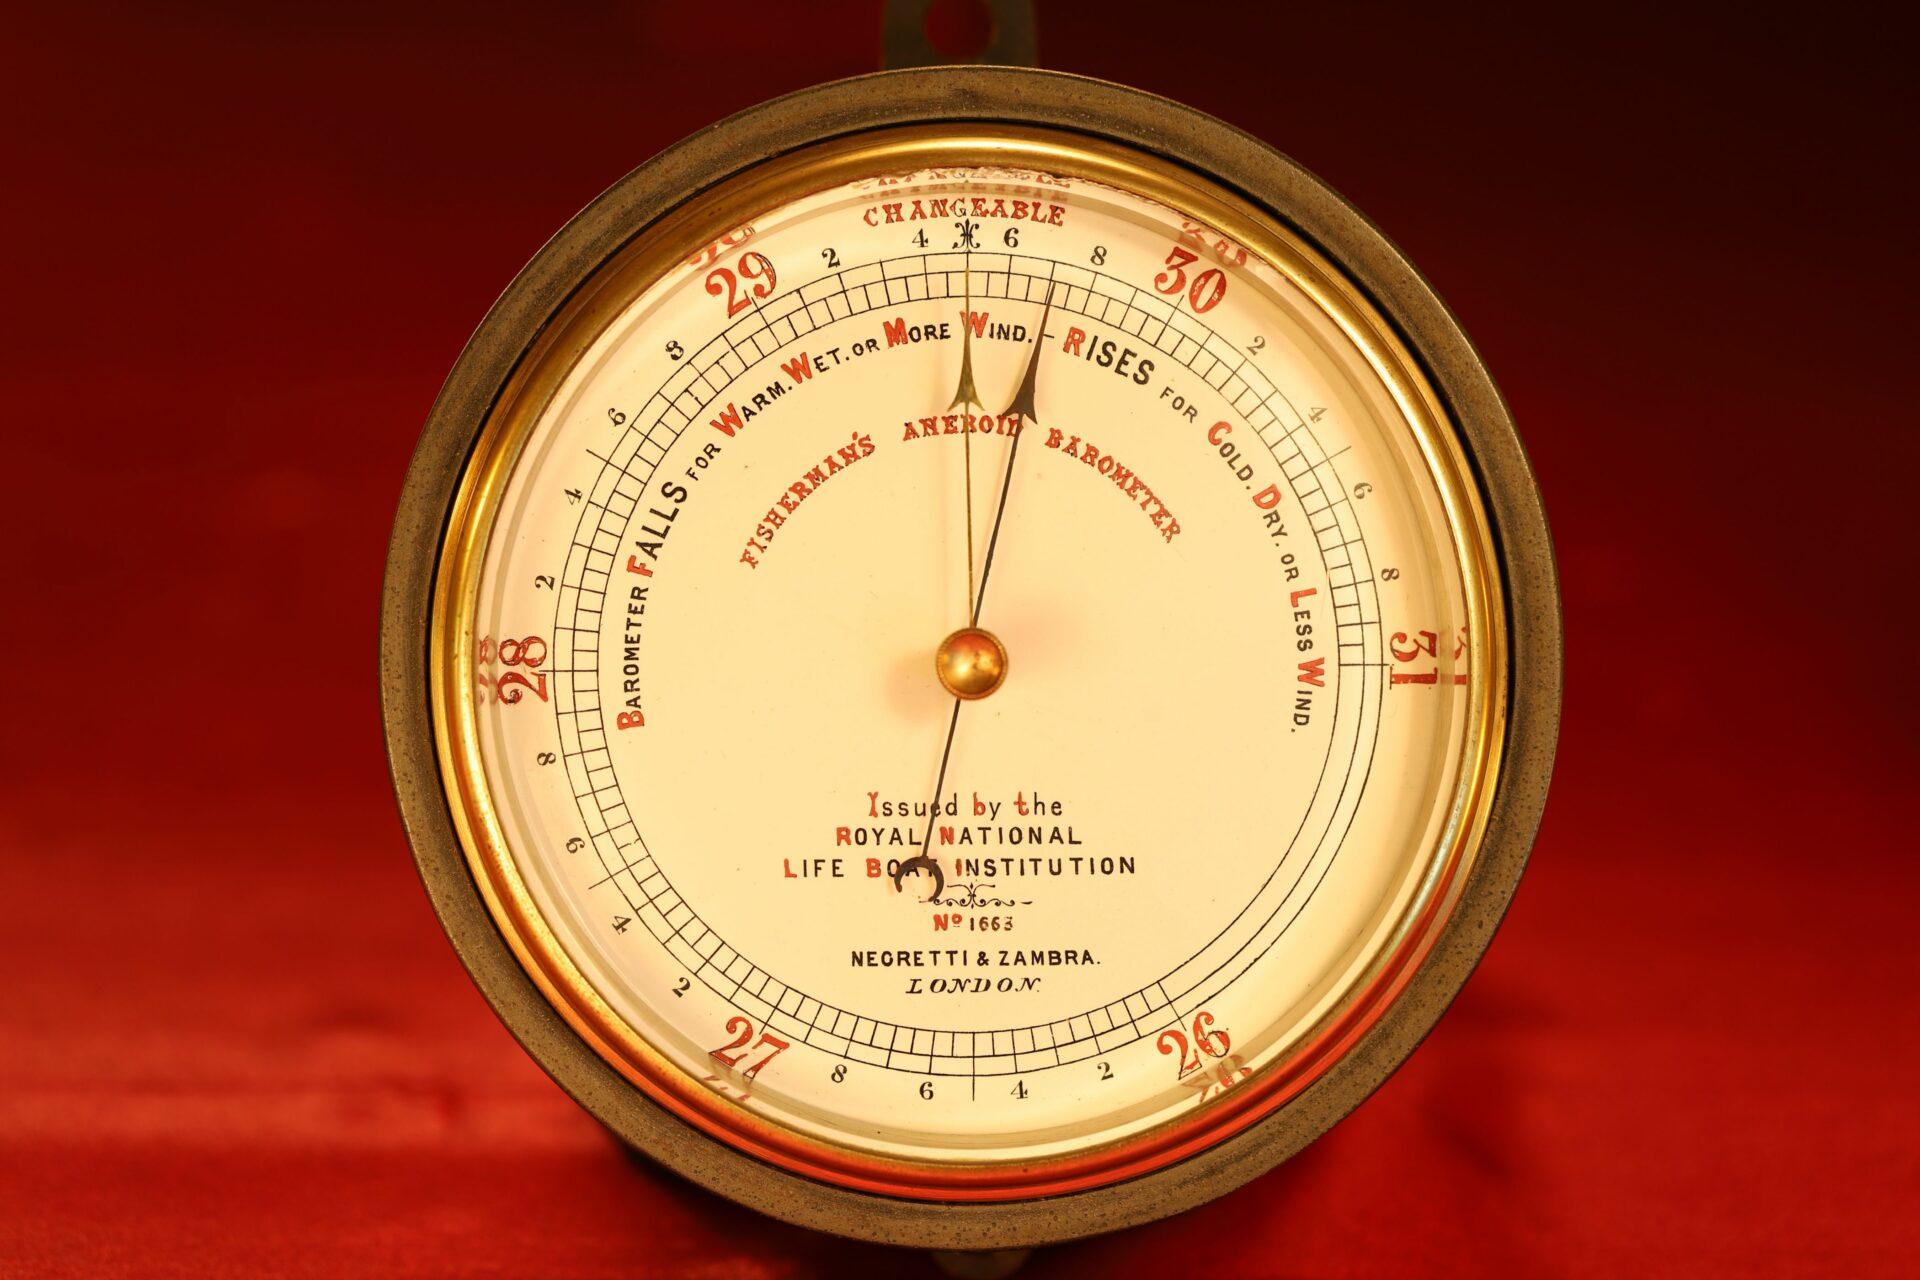 Image of Negretti & Zambra RNLI Fishermans Aneroid Barometer No 1663 taken from front